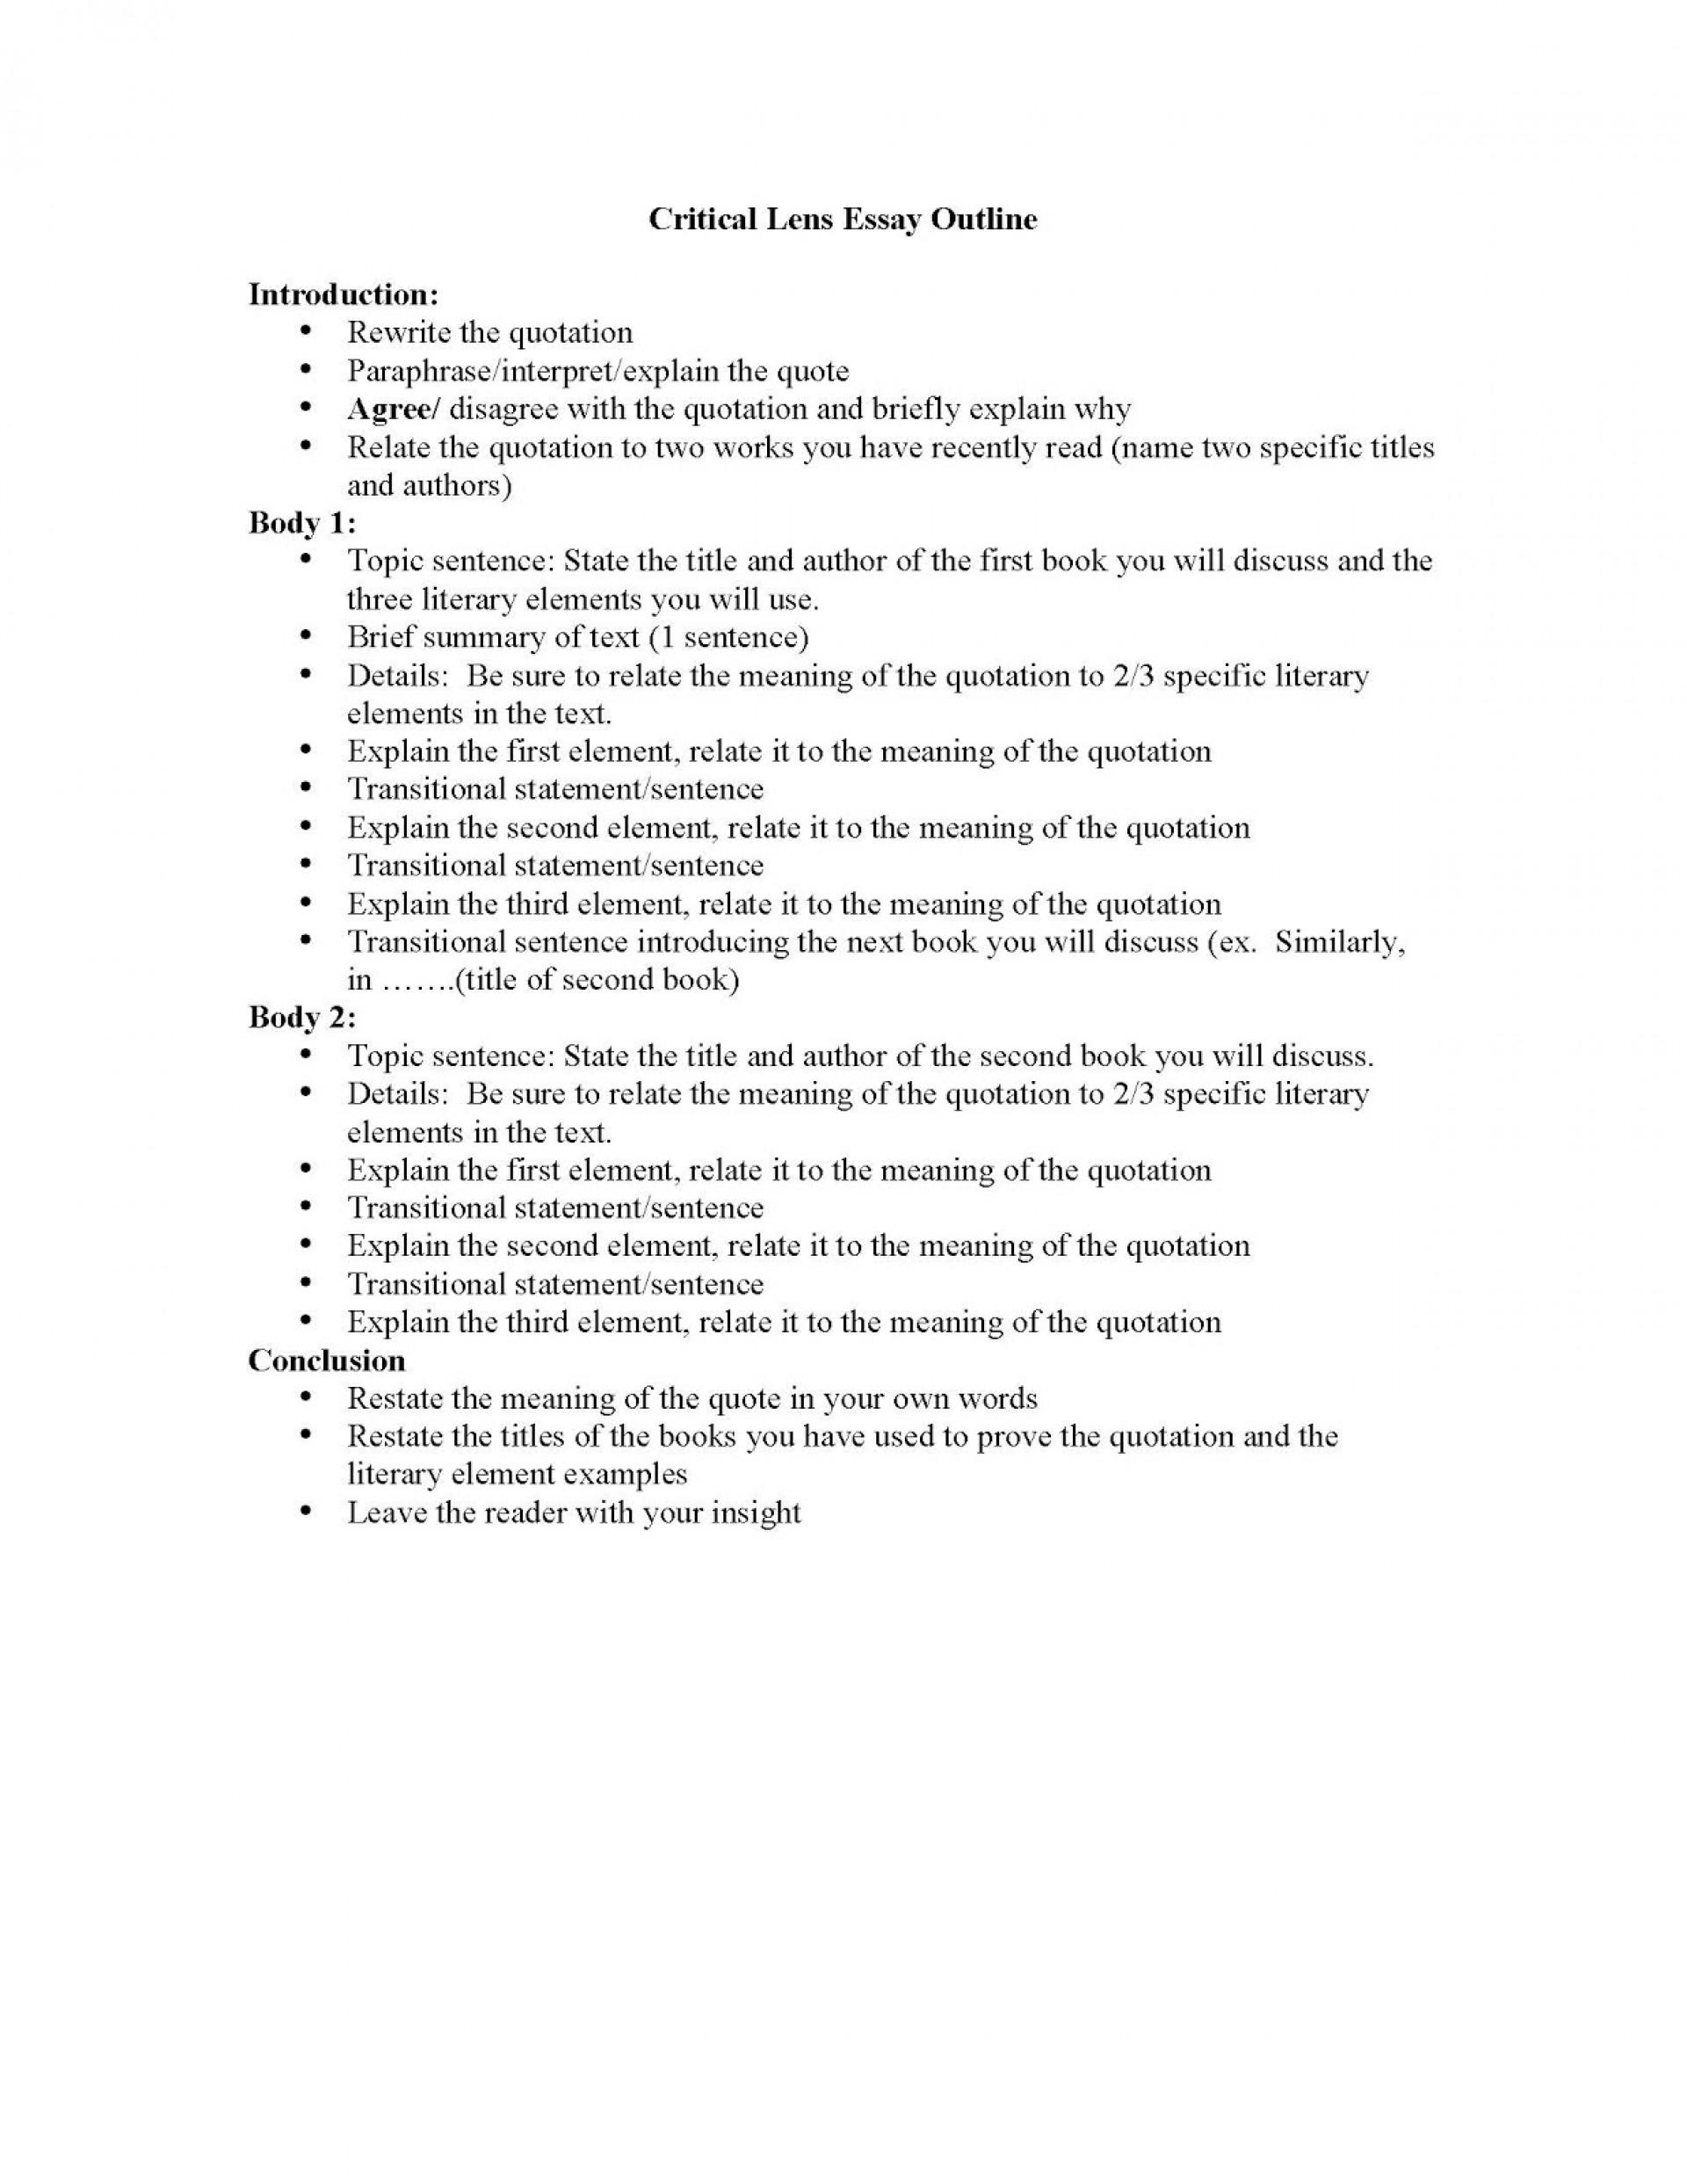 002 Essay Example Outline Of Criticallensessayoutlineandliterayelements Page 1 Impressive Argumentative Sample Mla Format 1920